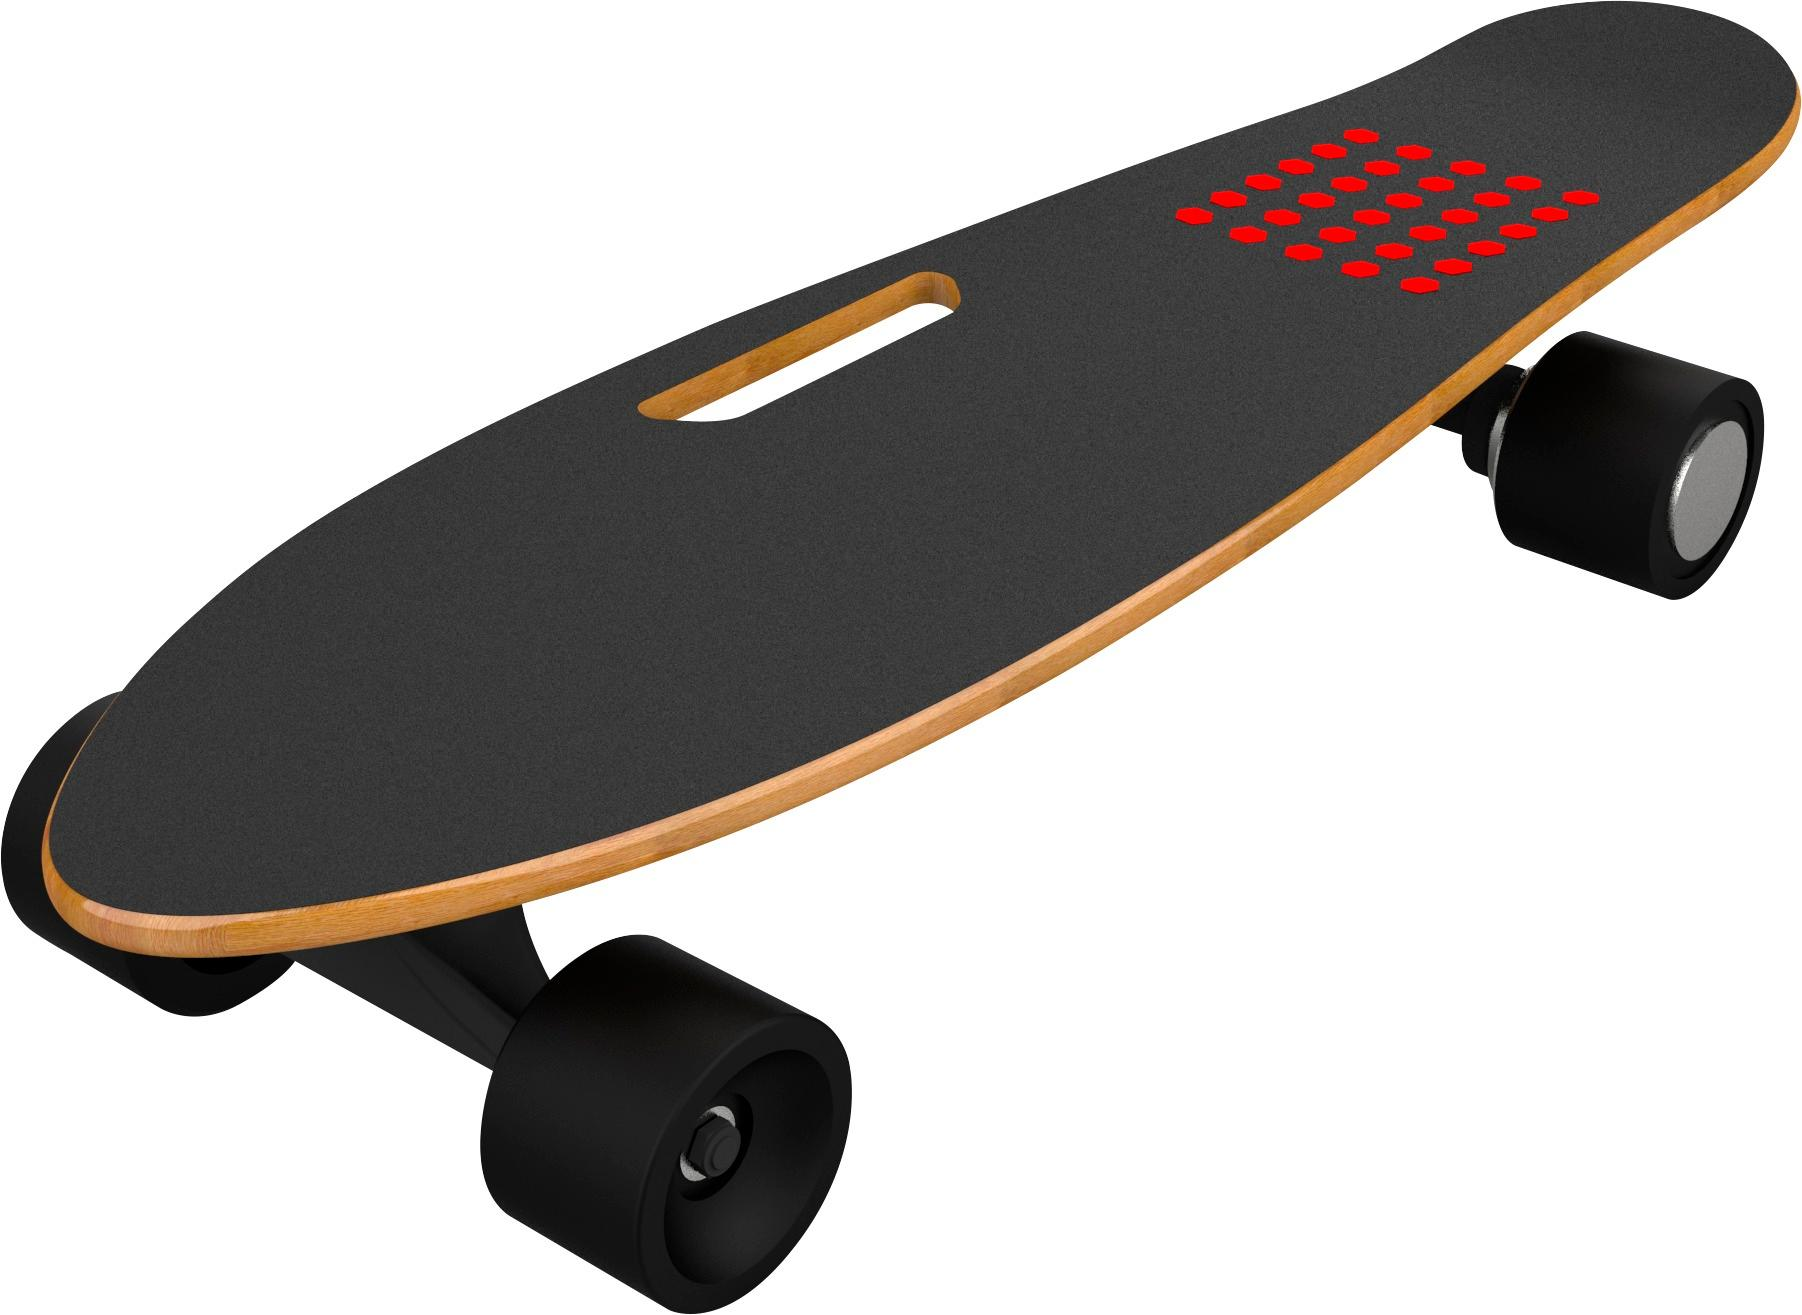 1802x1315 Hover 1 Cruze Electric Skateboard Black Hy Hsk Blk